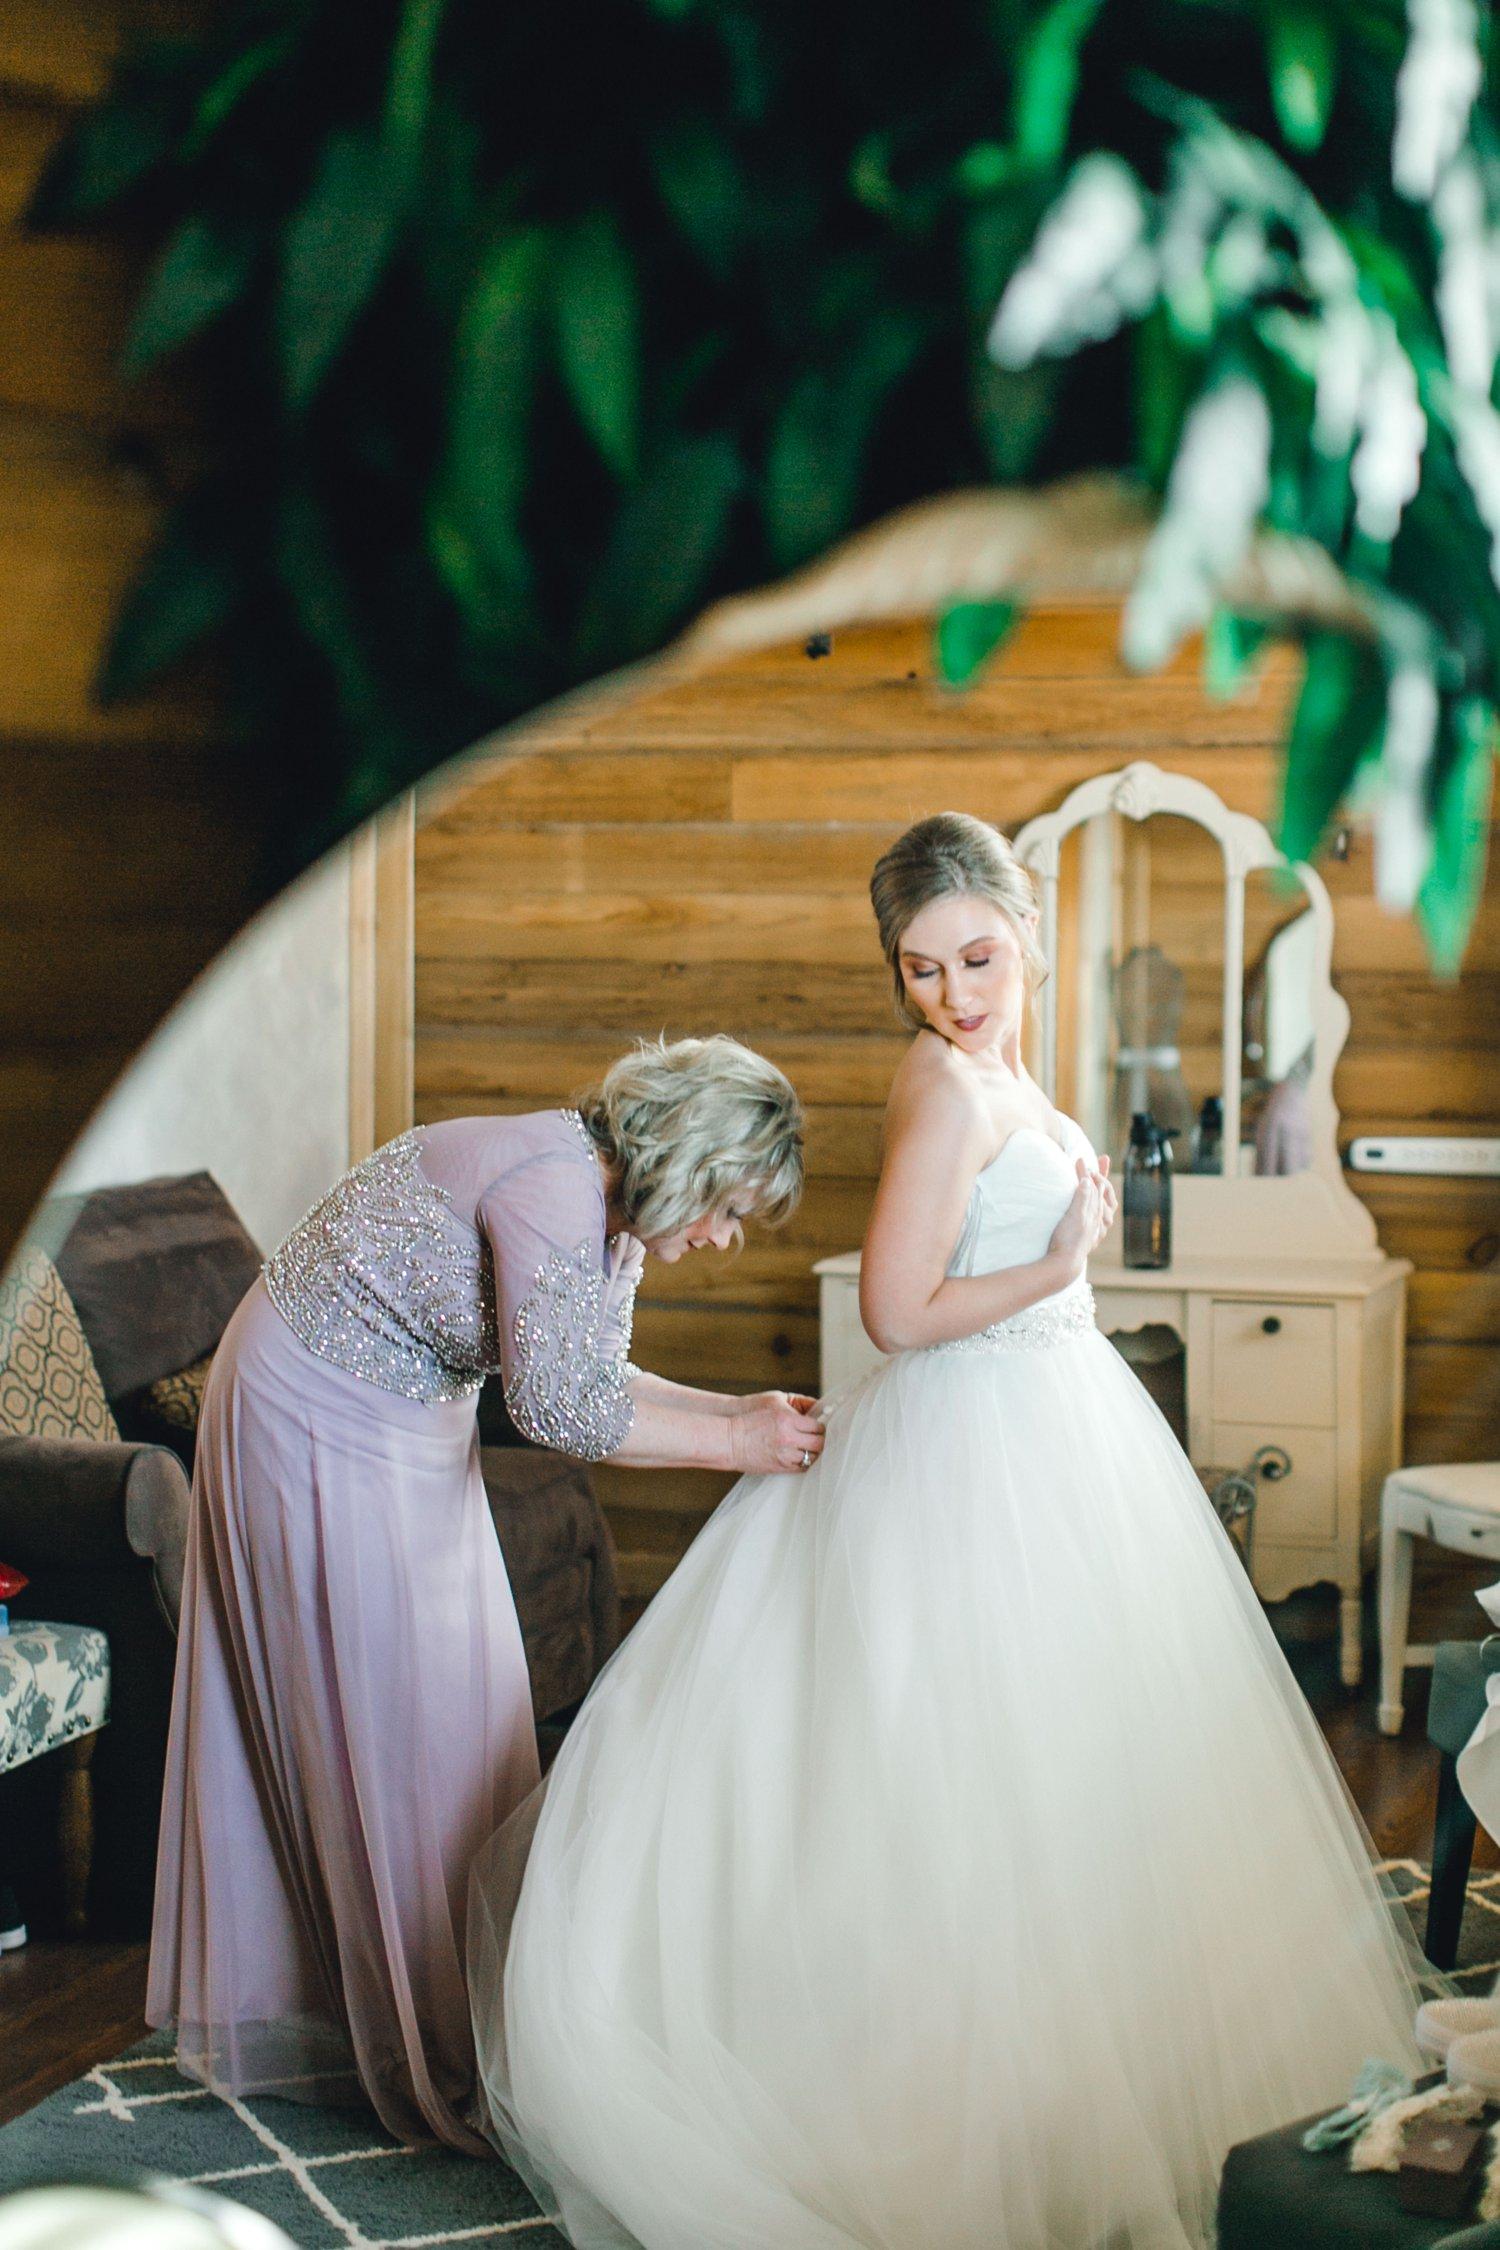 kayla-jacob-dow-cotton-creek-barn-lubbock-wedding-photographer-alleej0016.jpg